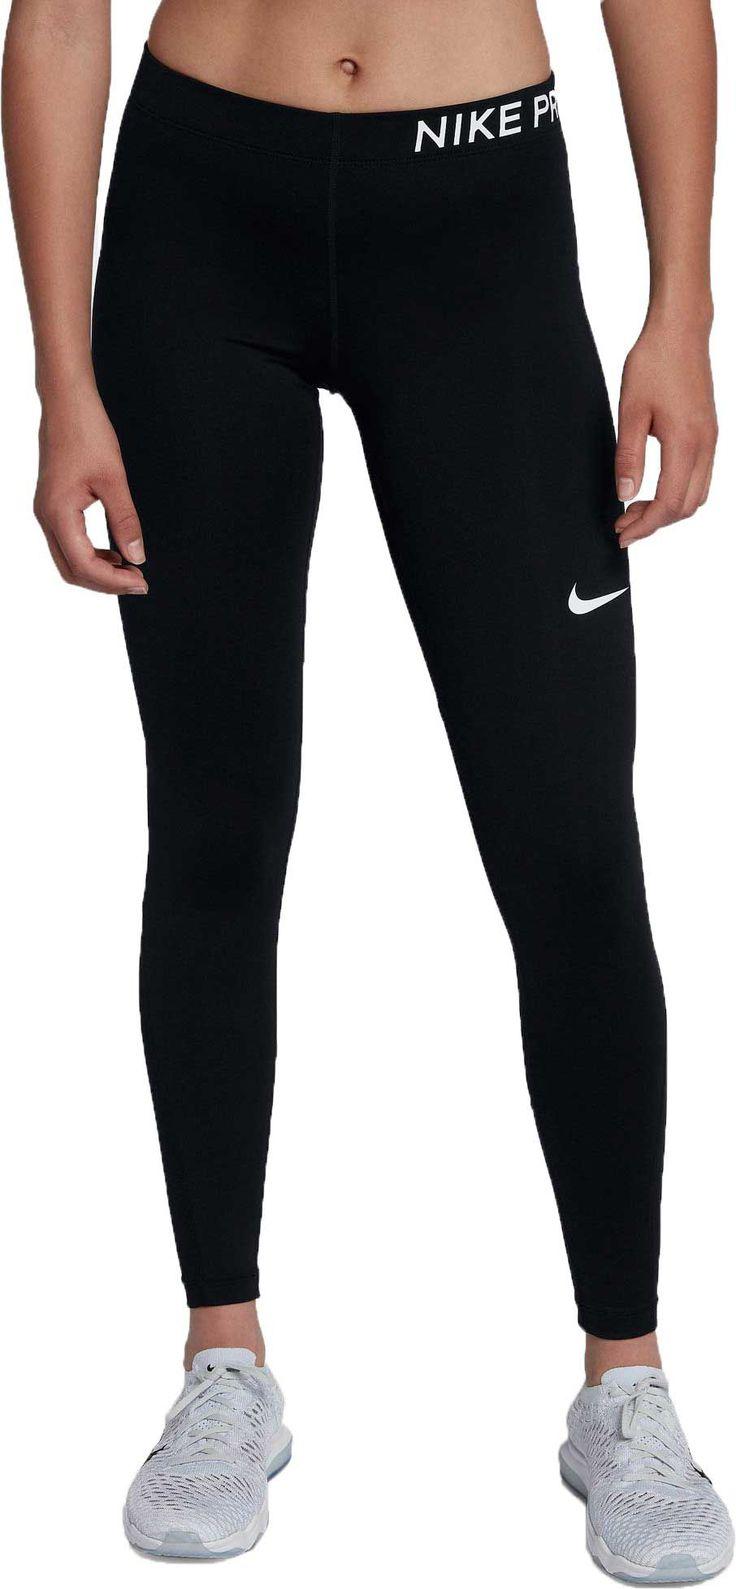 Nike Women's Pro Cool Tights